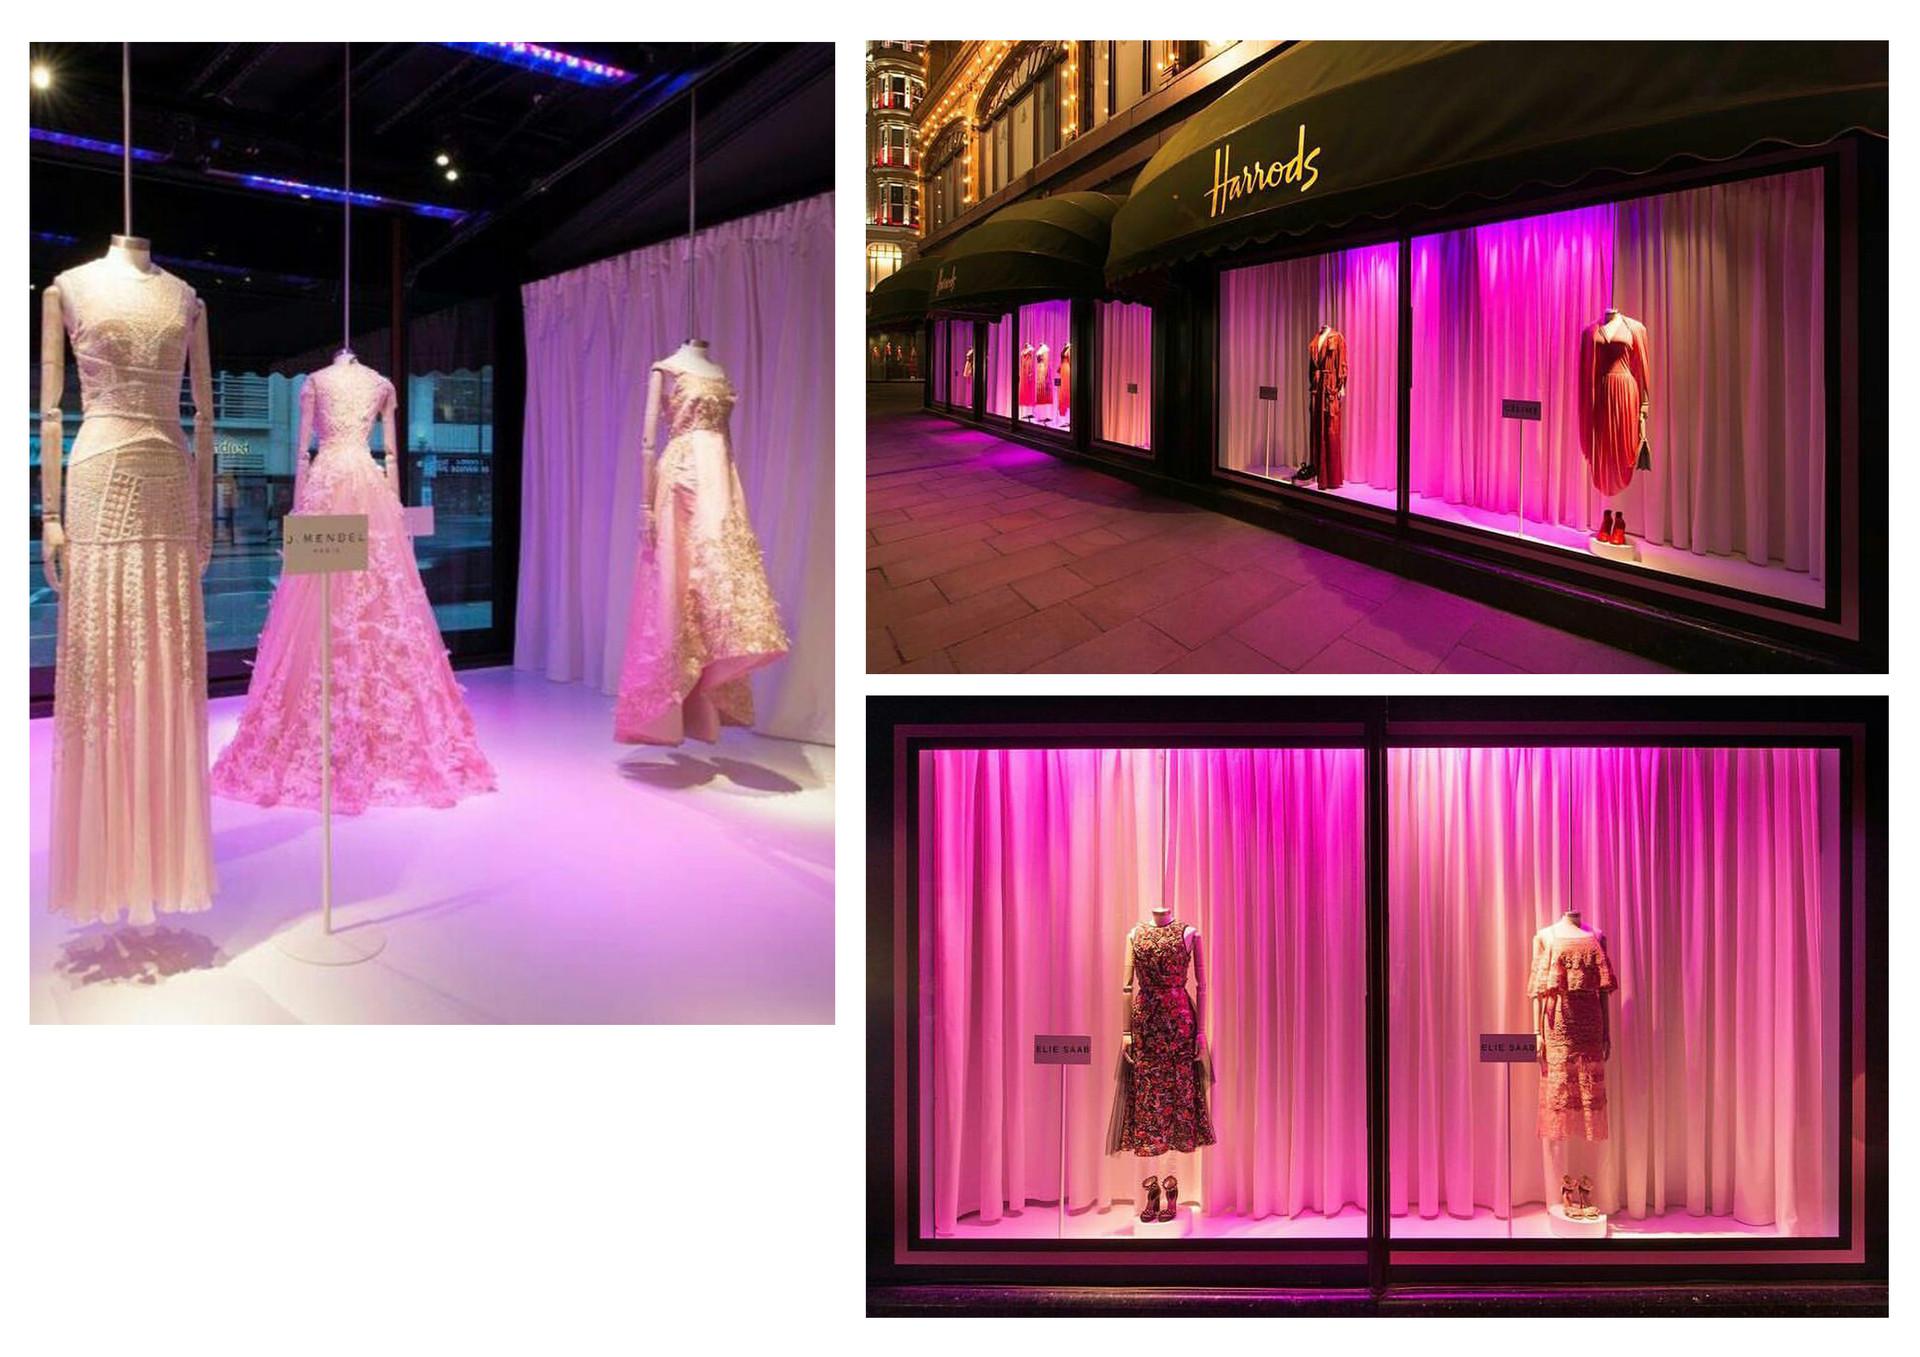 Harrods, new S/S17 designer collections launch, Jan 2017